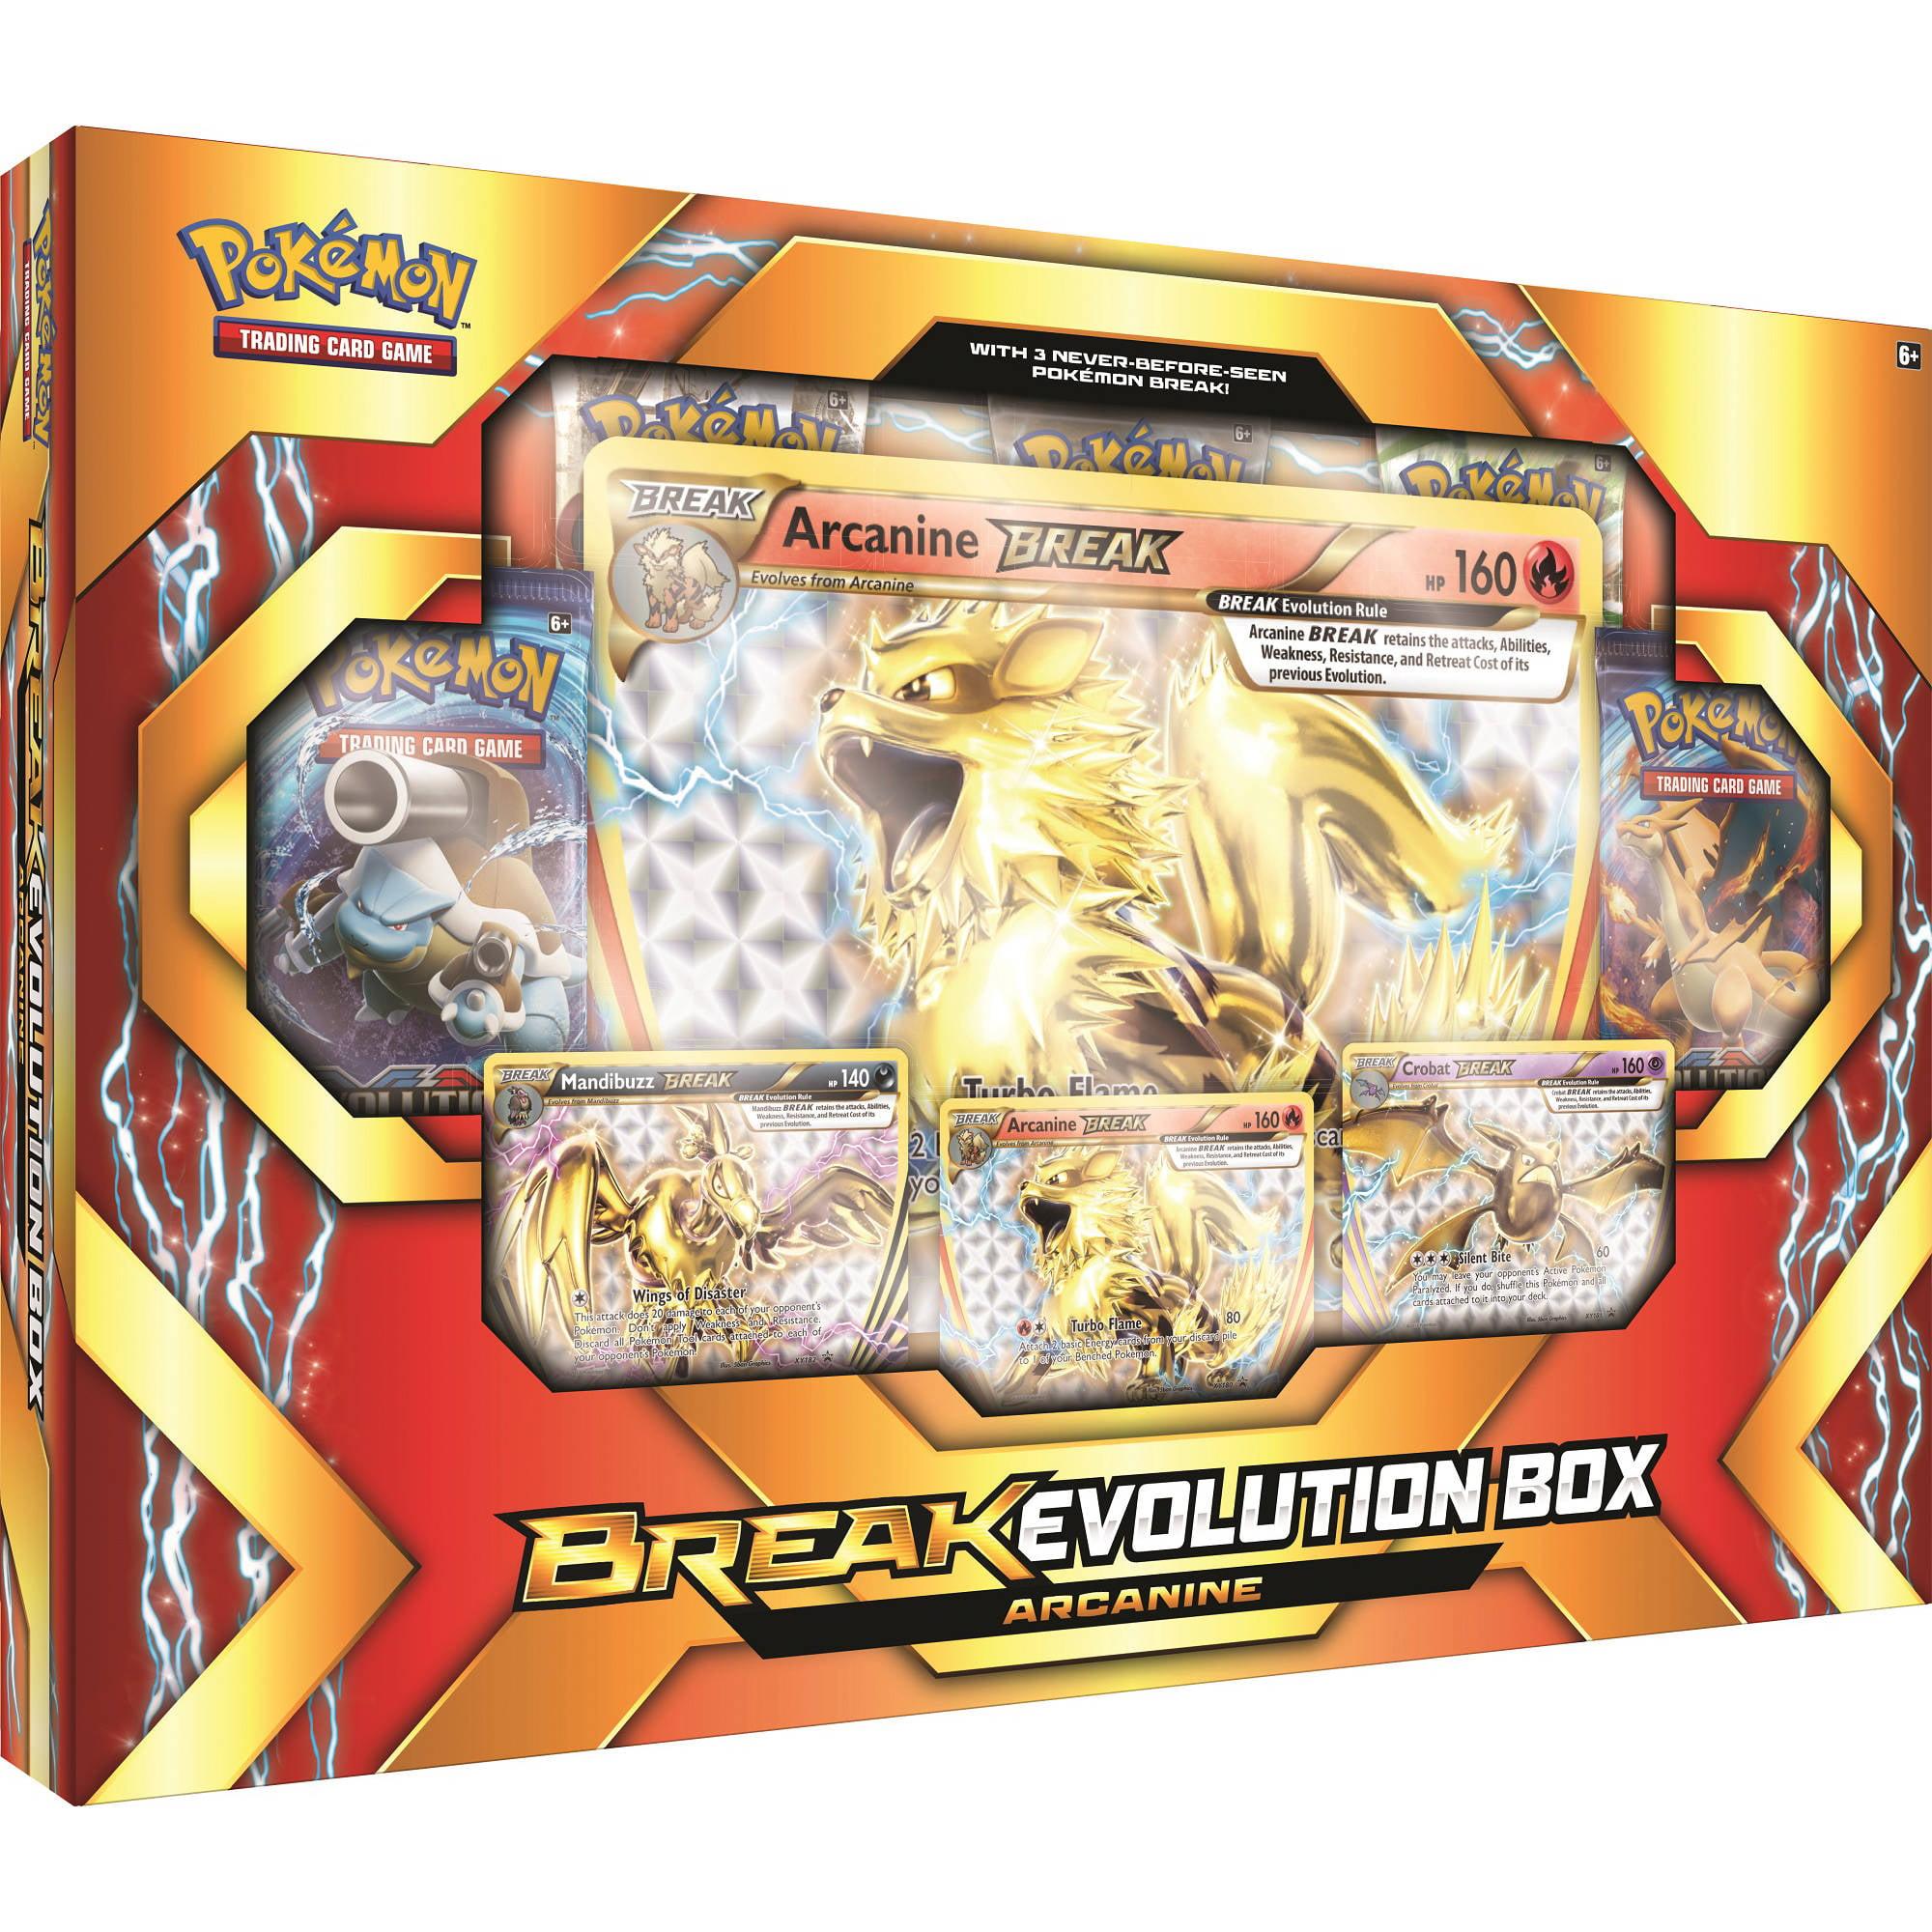 POKEMON 2017 BREAK EVOLUTION BOX ARCANINE